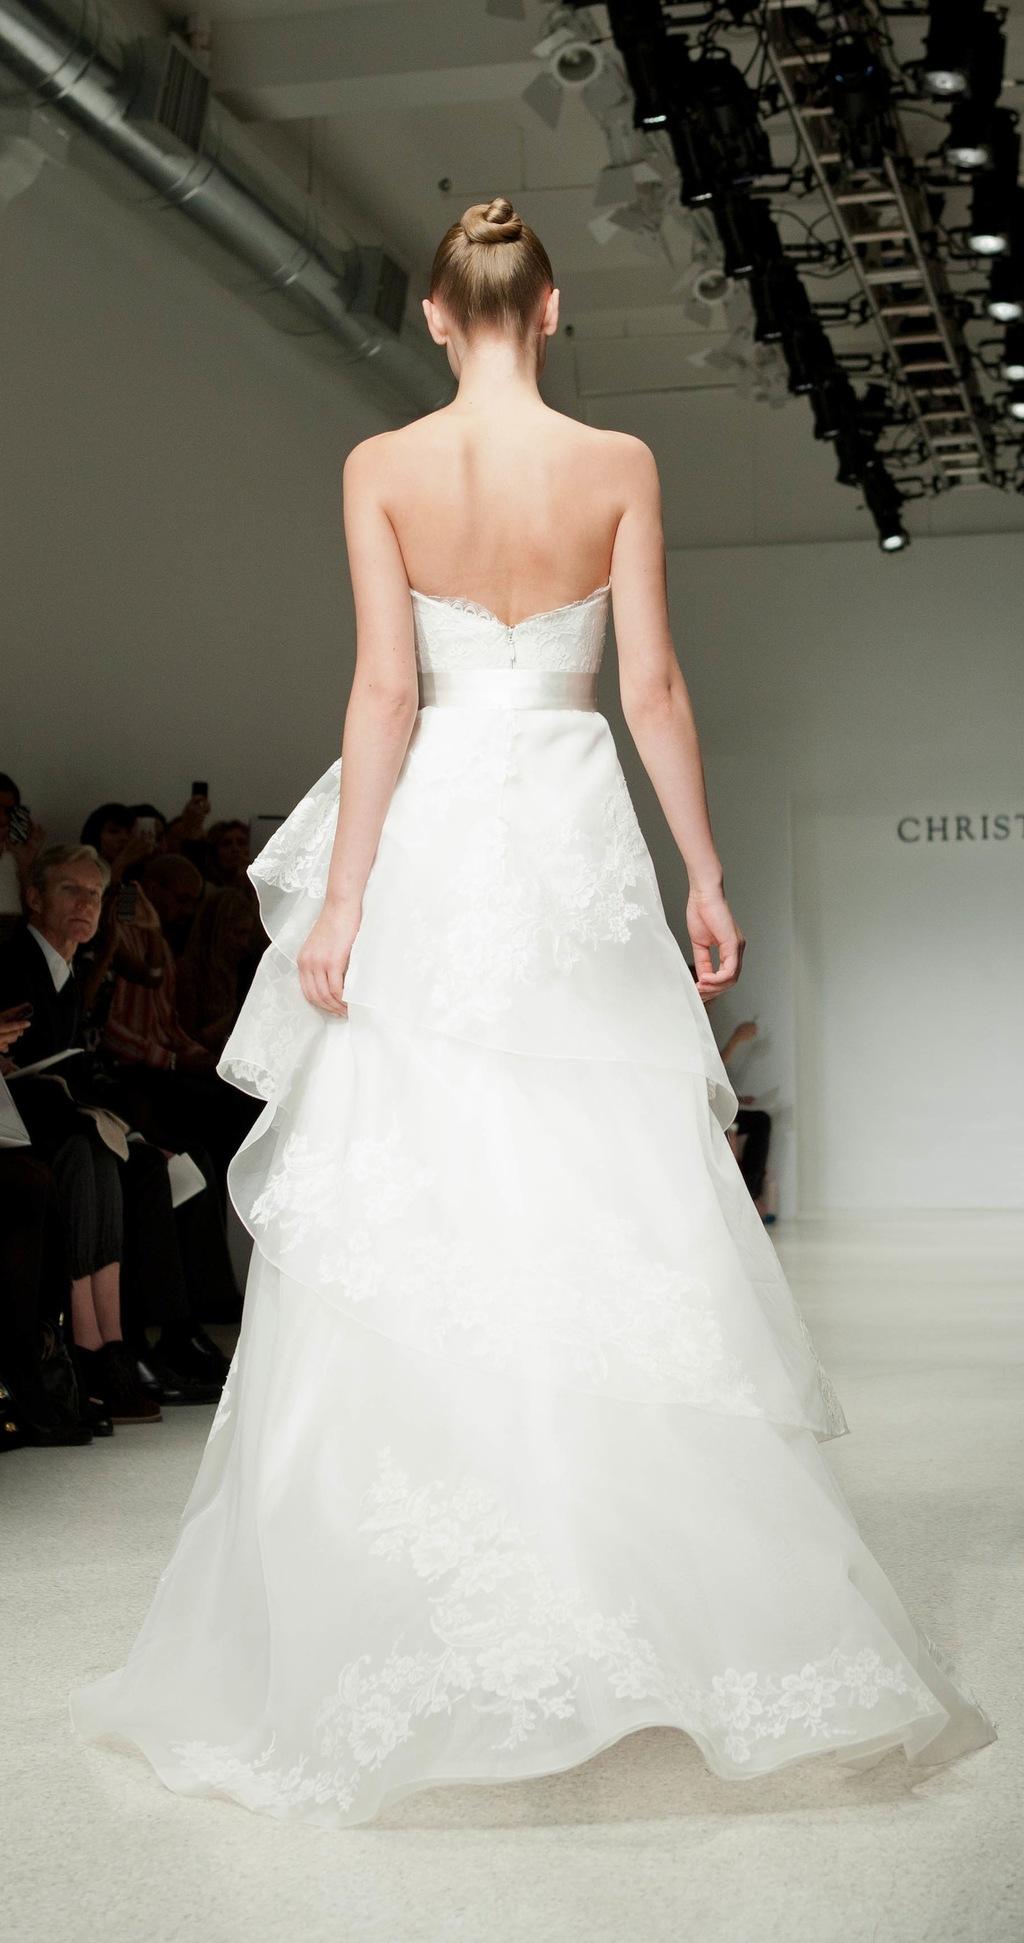 2012_wedding_dress_christos_bridal_gowns_ellis_back.full